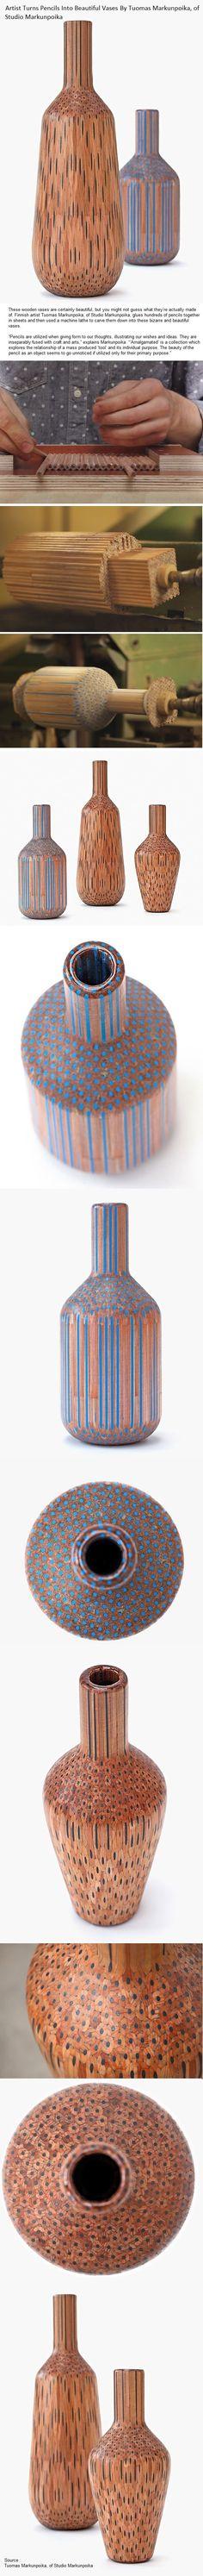 Artist Turns Pencils Into Beautiful Vases